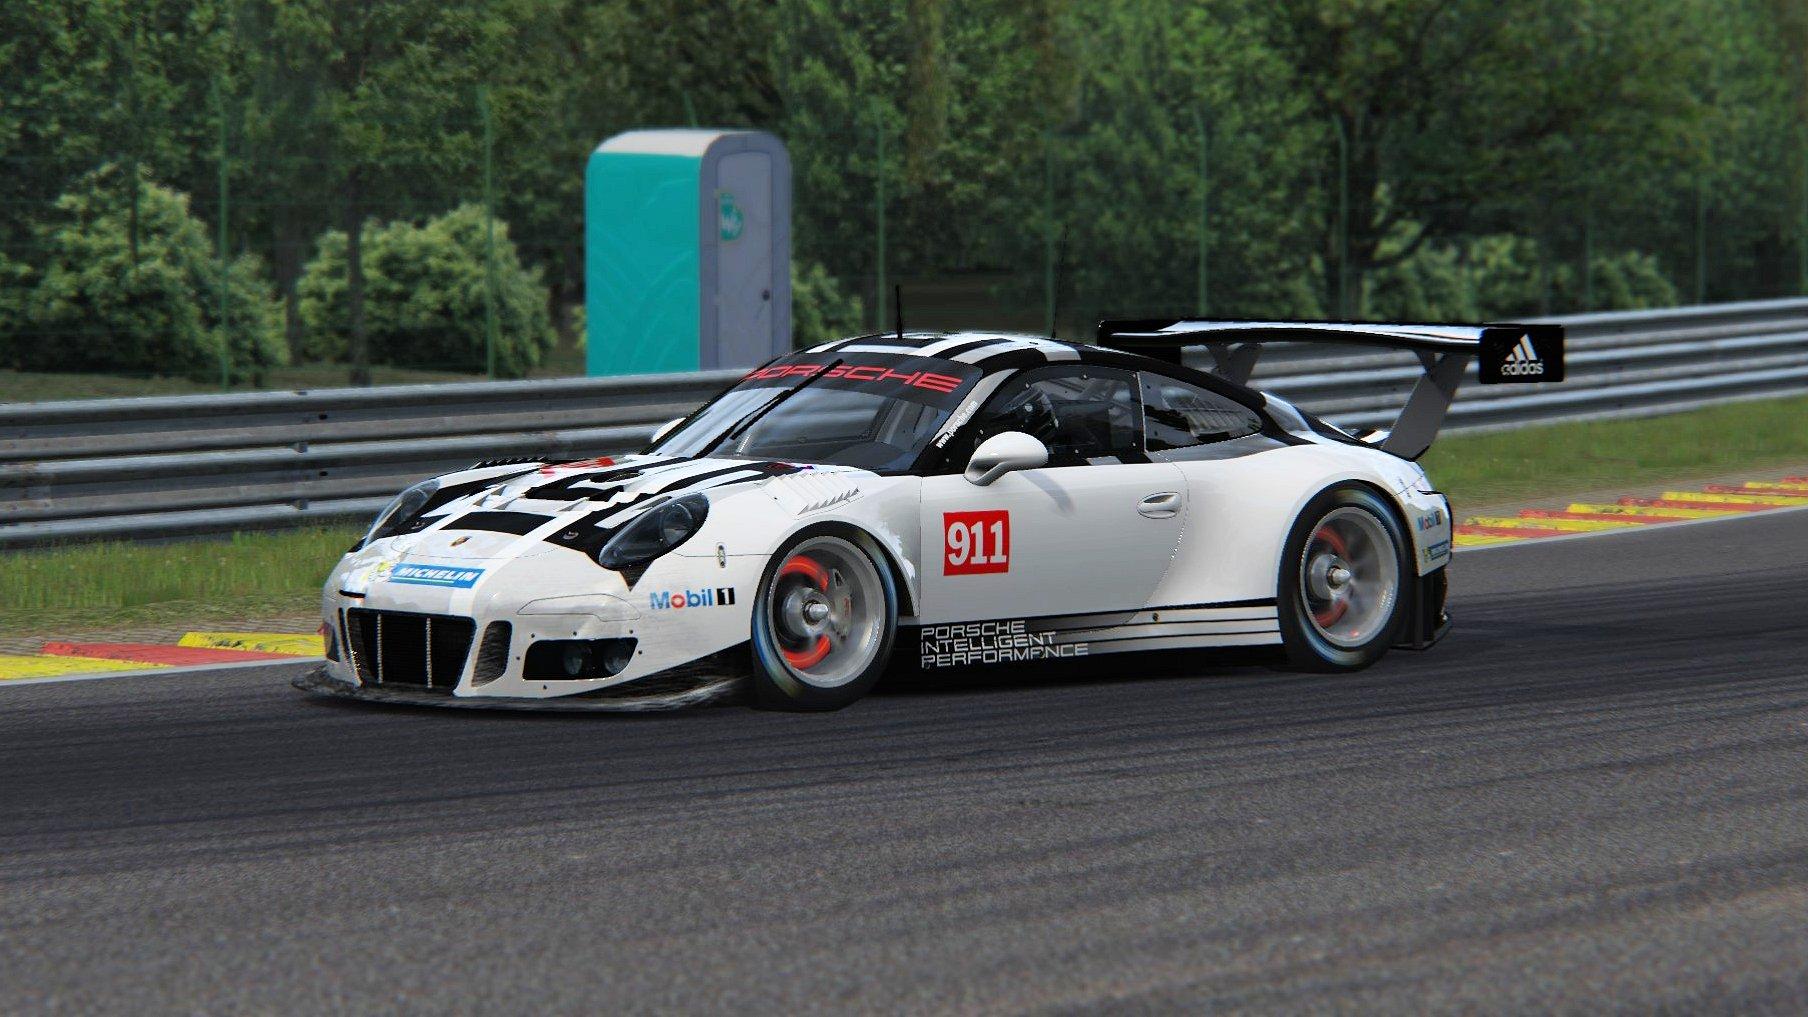 porsche 911 gt2 assetto corsa assetto corsa porsche 911 993 youtube porsche 911 gt3 rs test. Black Bedroom Furniture Sets. Home Design Ideas